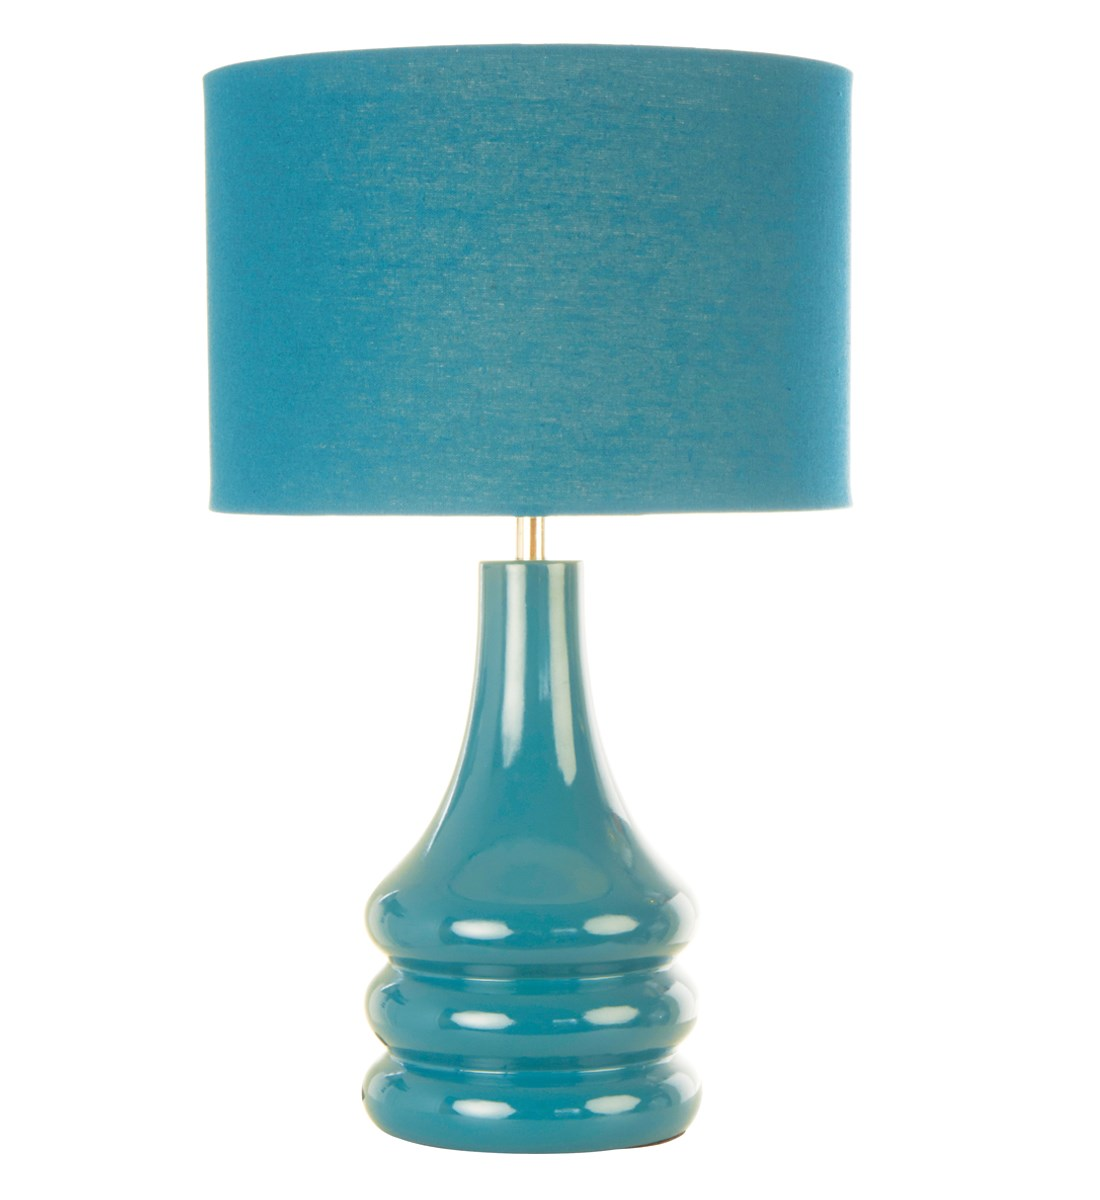 Image of: Raj Table Lamp Teal Blue Bright Stylish Table Lamp